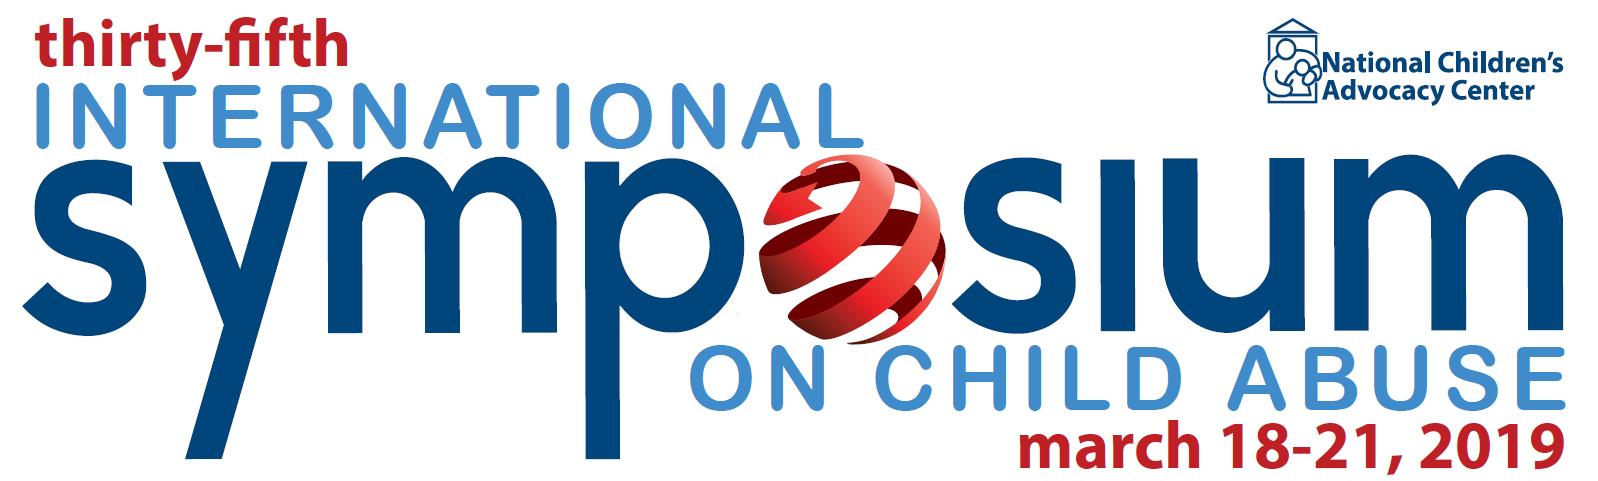 35th International Symposium on Child Abuse